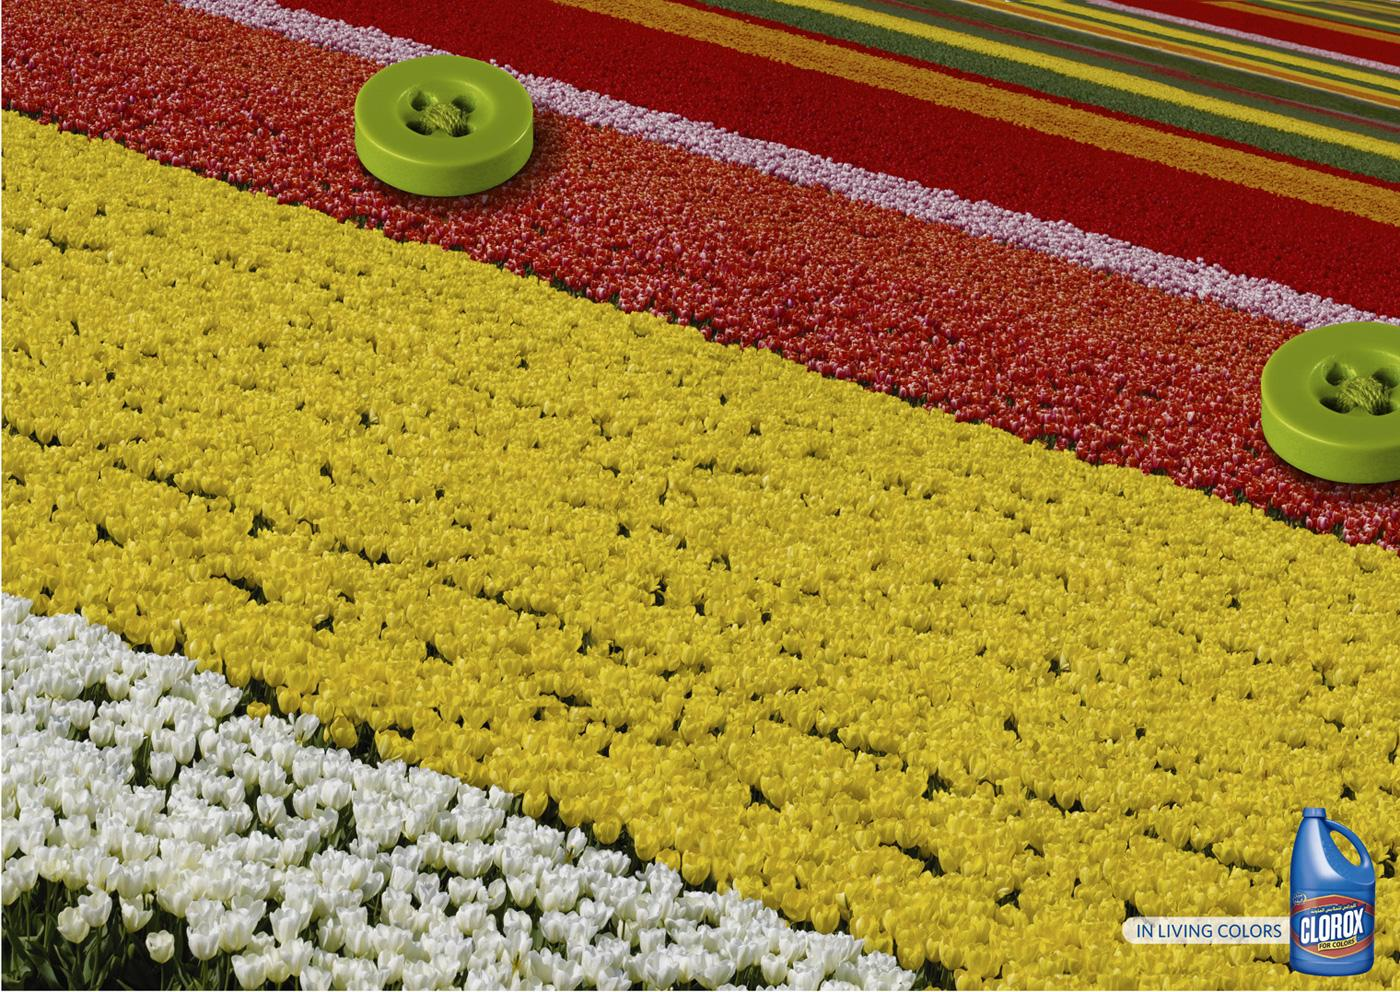 Clorox Print Ad -  Flower bed